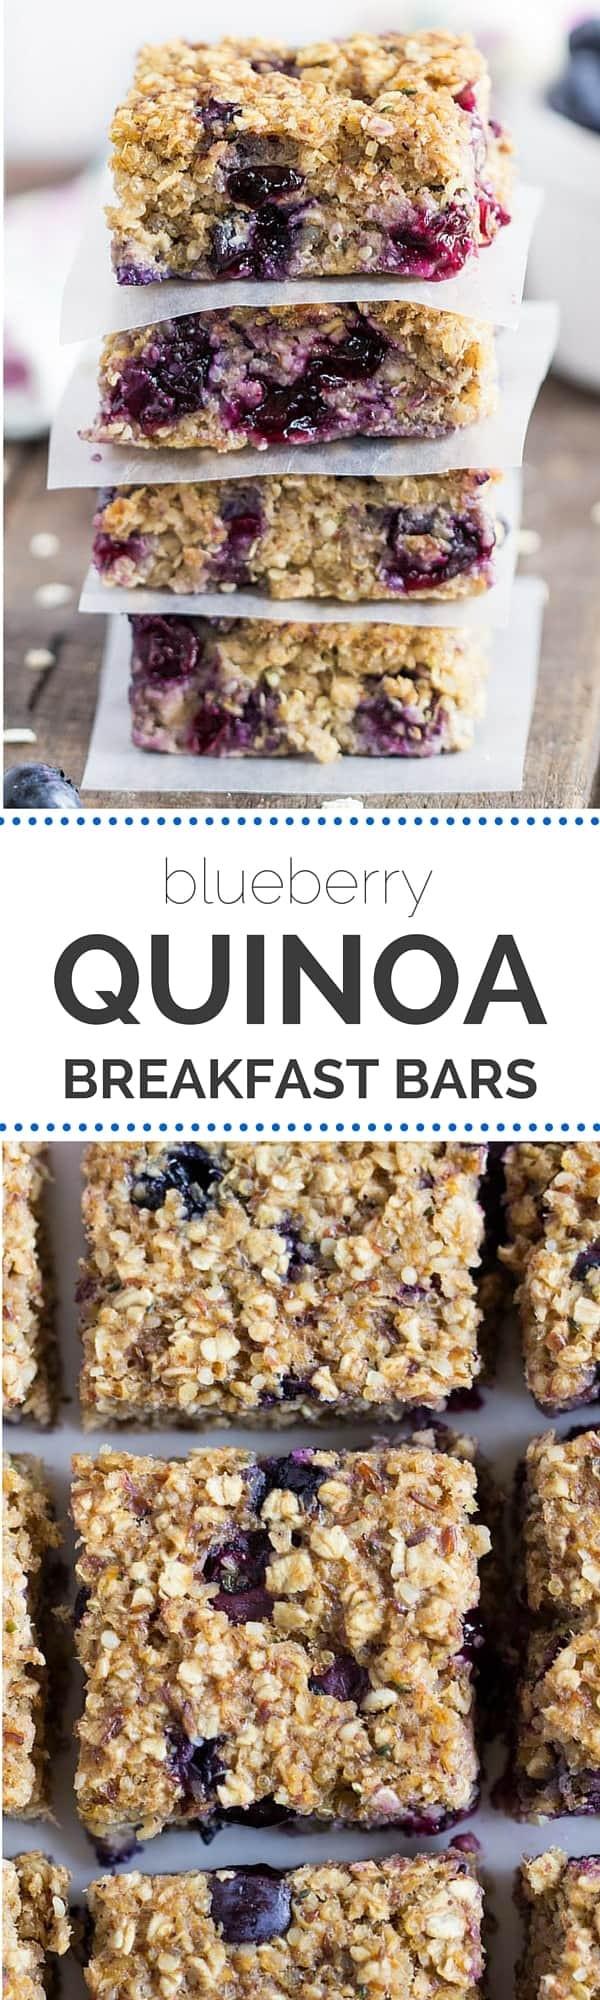 Quinoa Breakfast Bars  Blueberry Quinoa Breakfast Bars Simply Quinoa